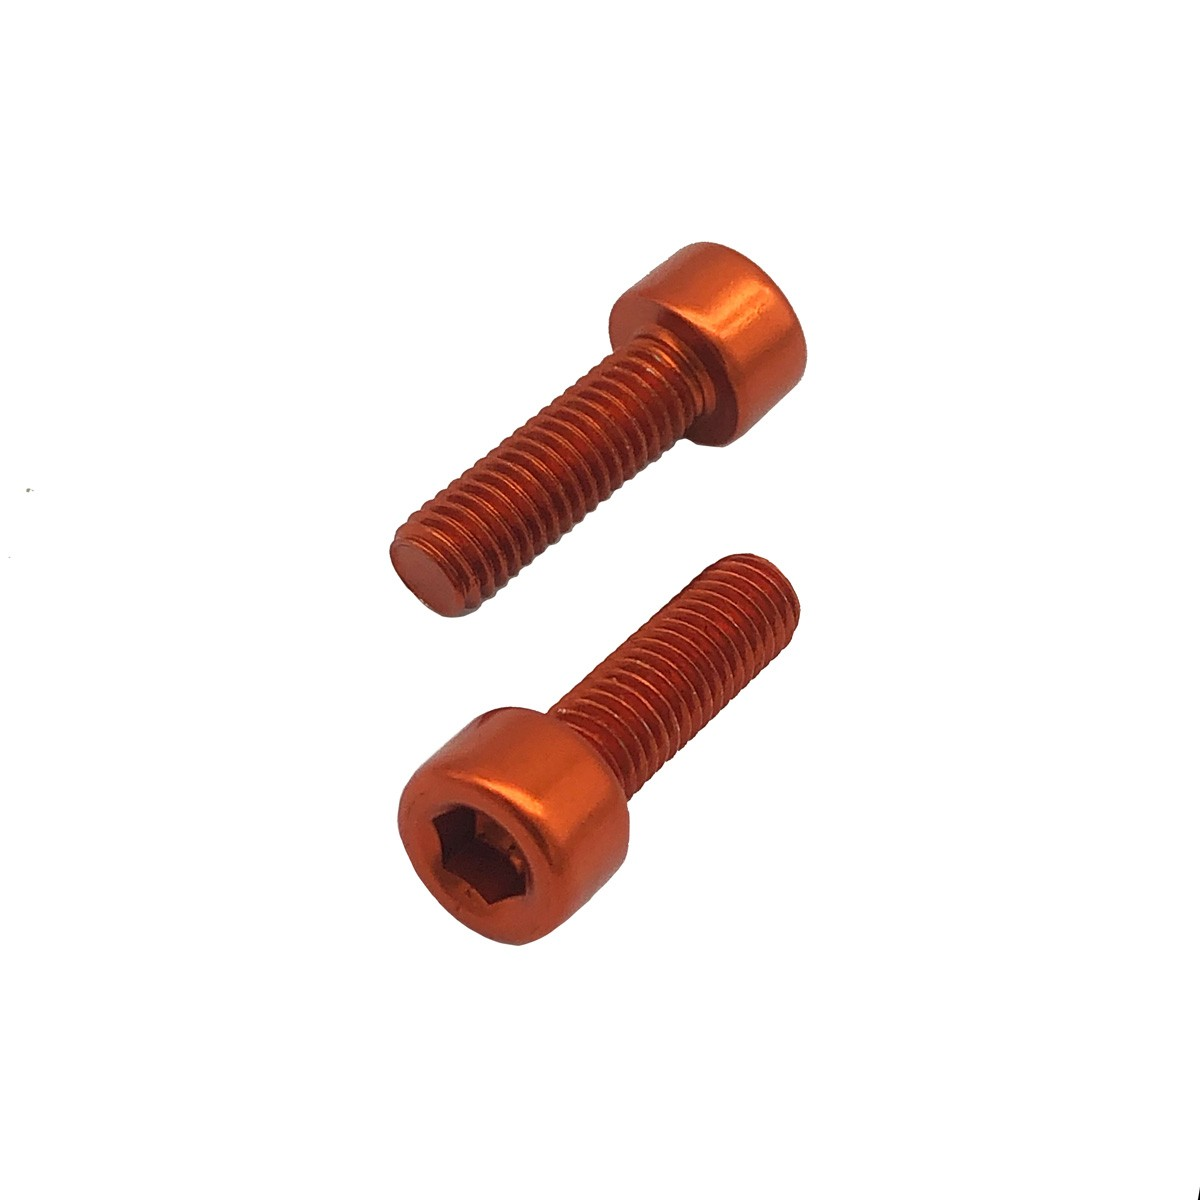 Parafuso Allen de Aluminio Socket Cap M5 x 16mm Unidade Laranja